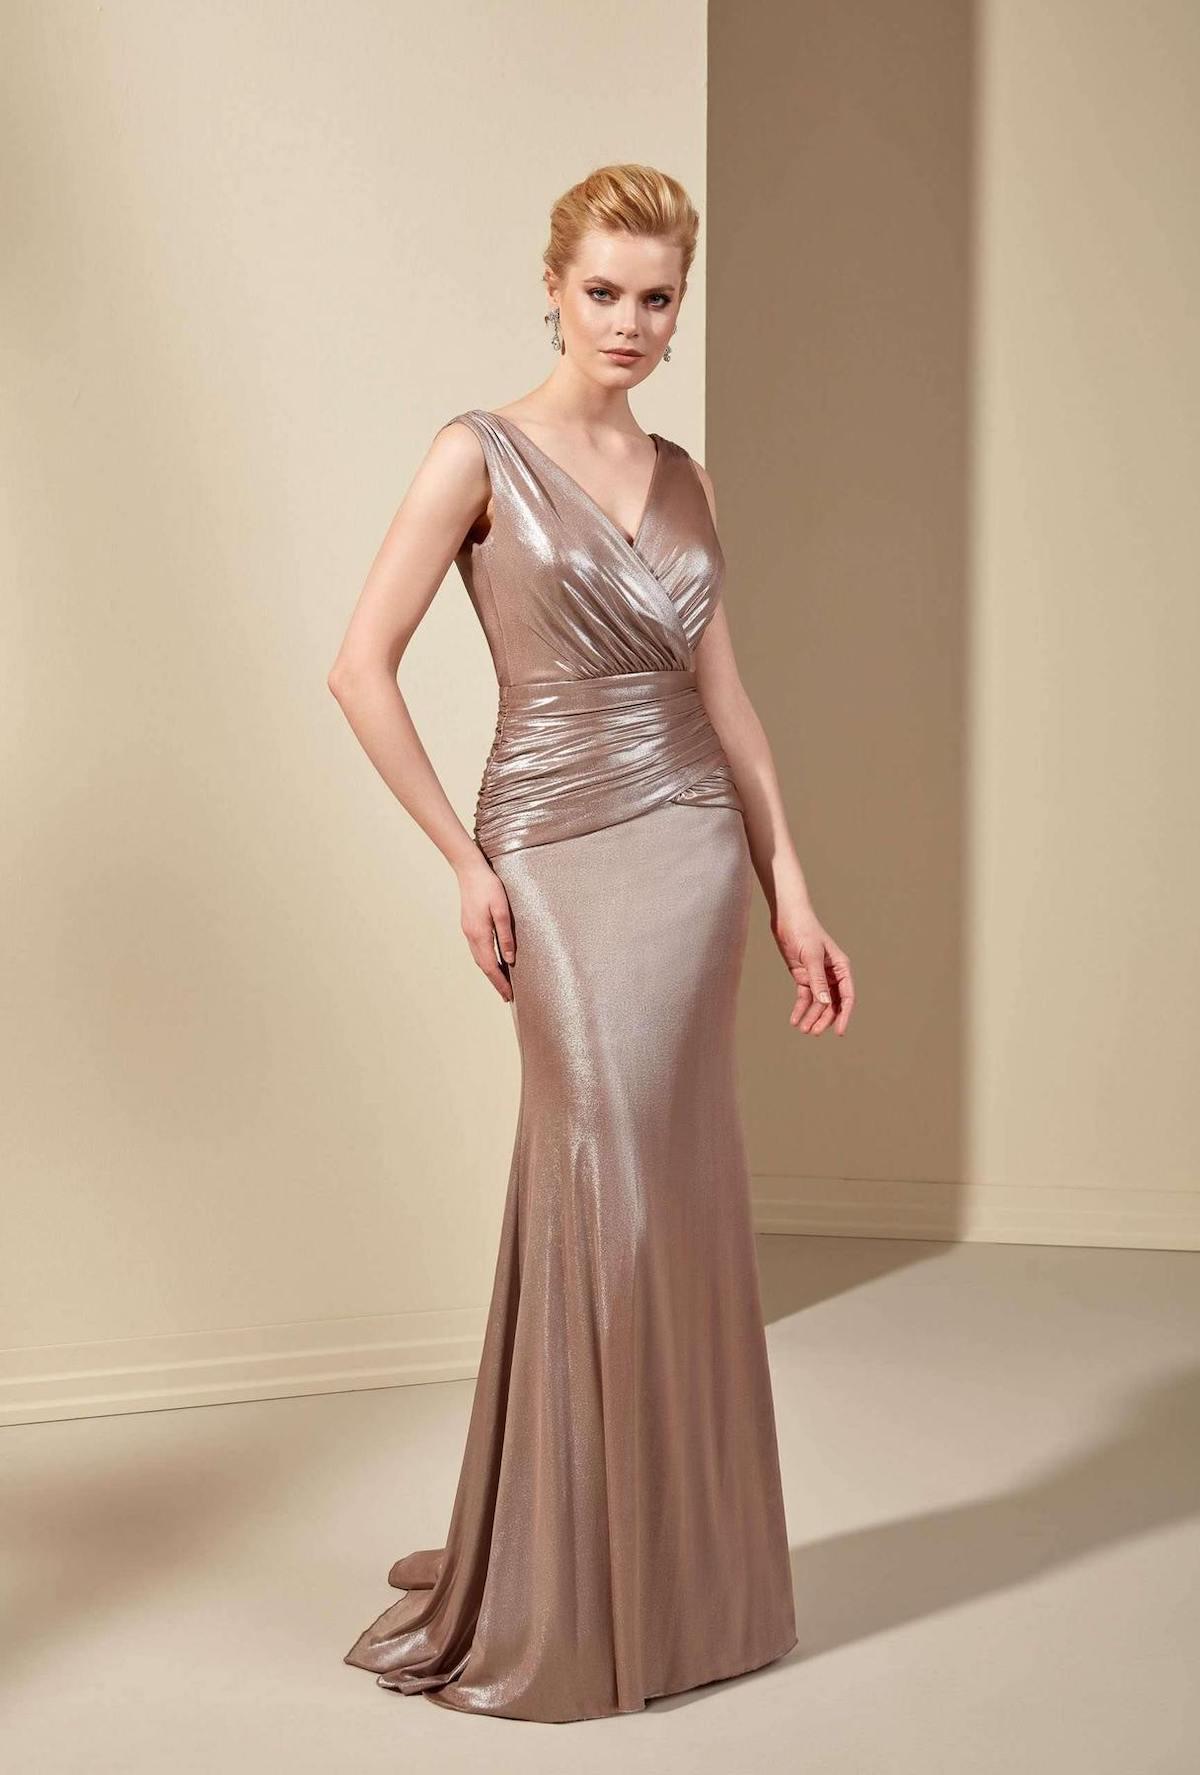 V-neck metallic rose gold dress for mother of the bride or groom